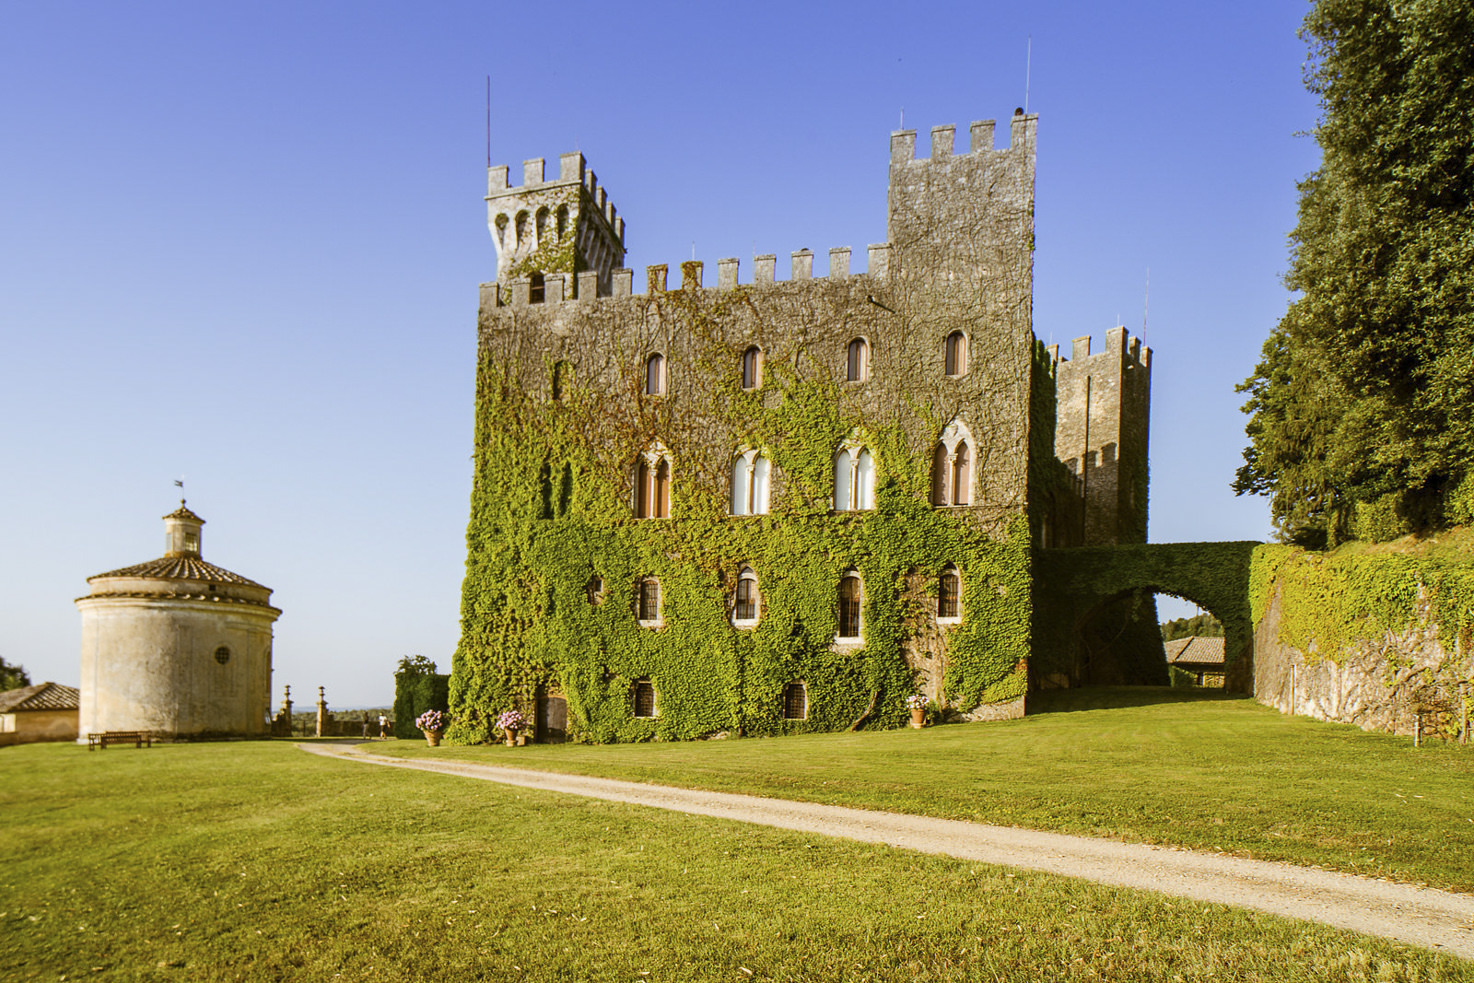 Castello di Celsa for weddings in Siena